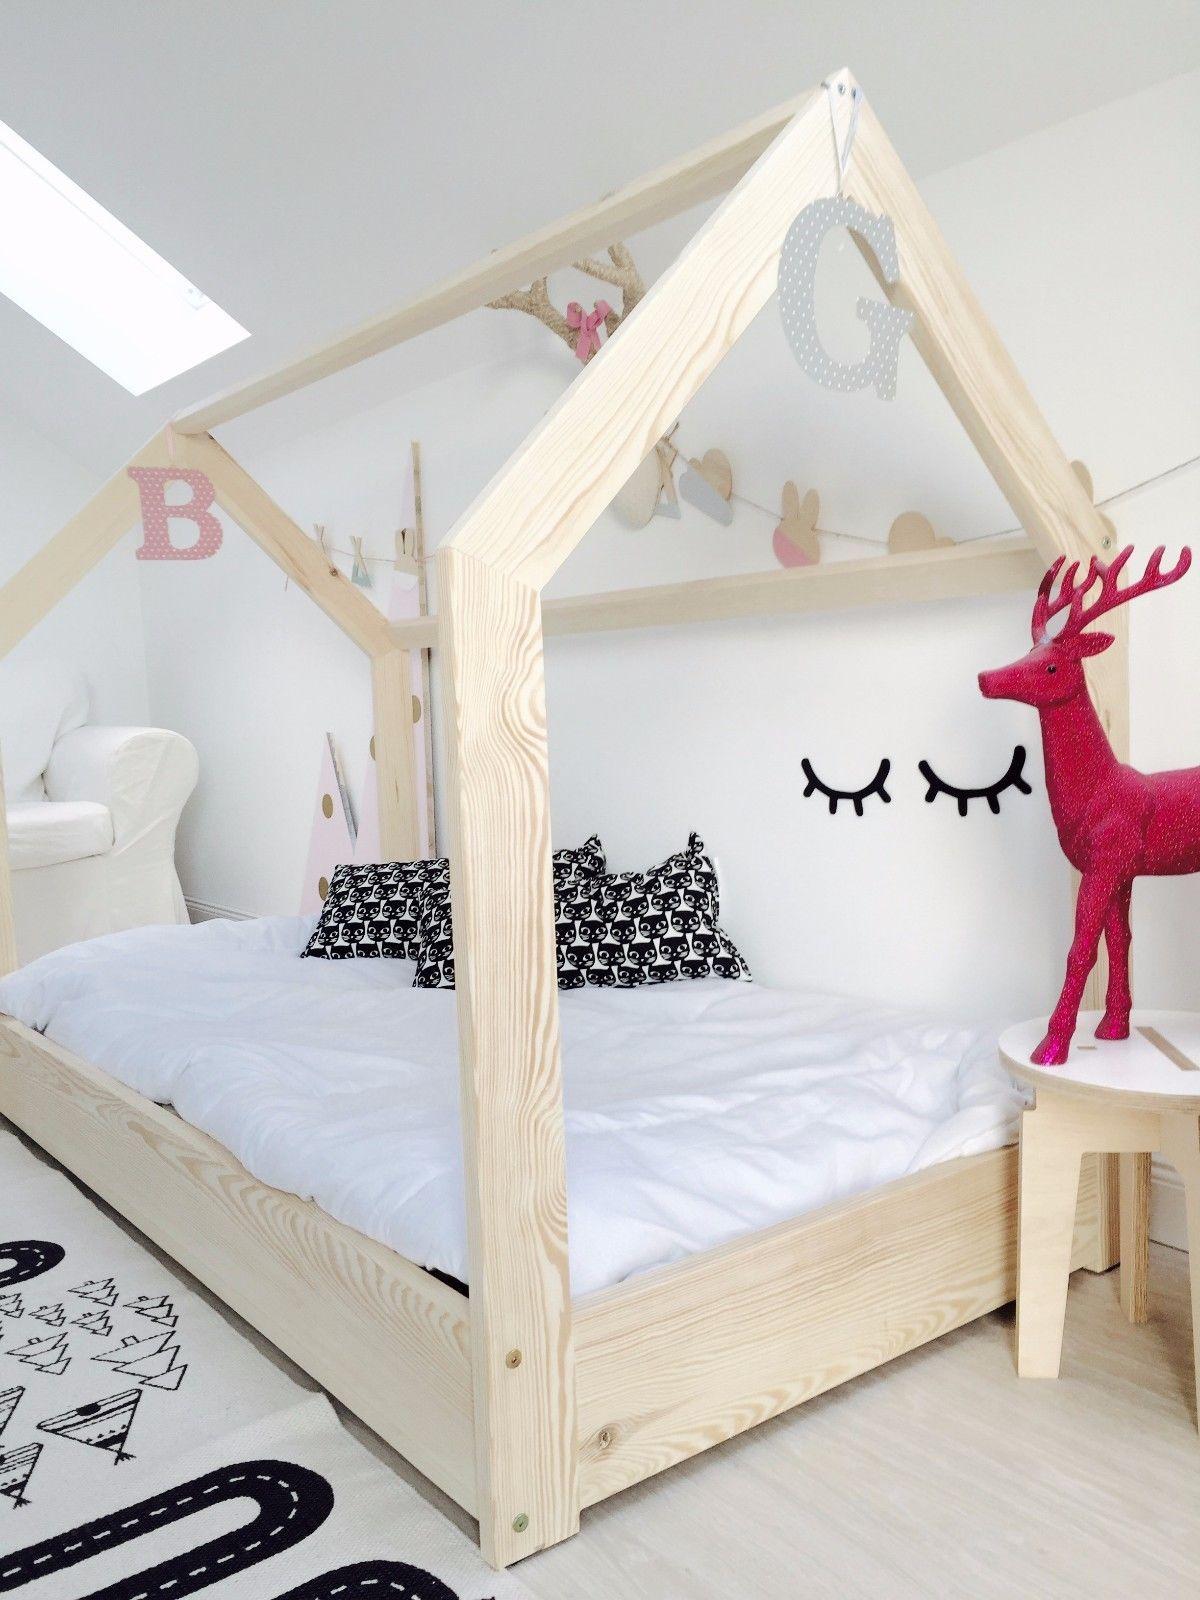 Hausbett Kinderhaus Farben Sicherheitbarieren House Bed Kinderbett